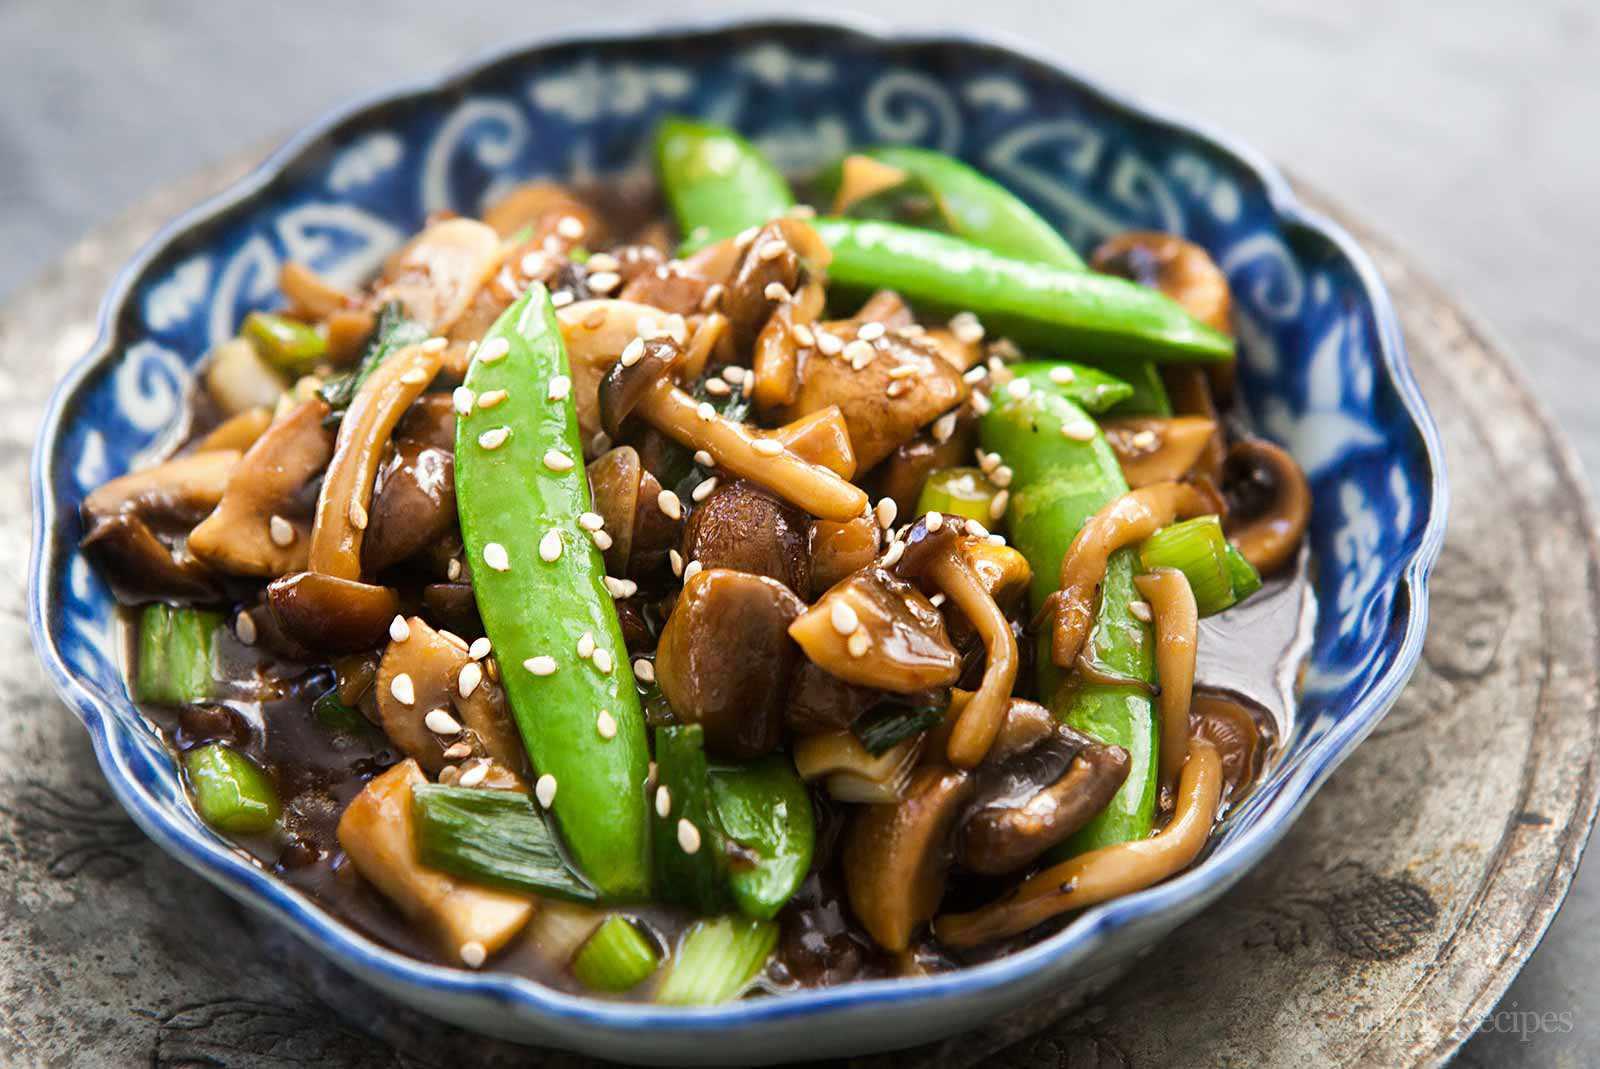 Mushroom Stir Fry with Peas and Green Onions